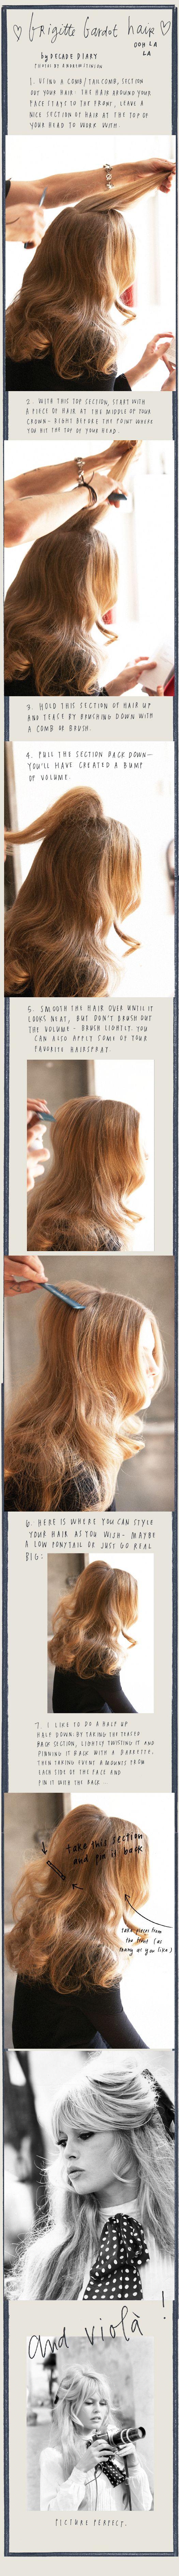 bridgett bardot hair